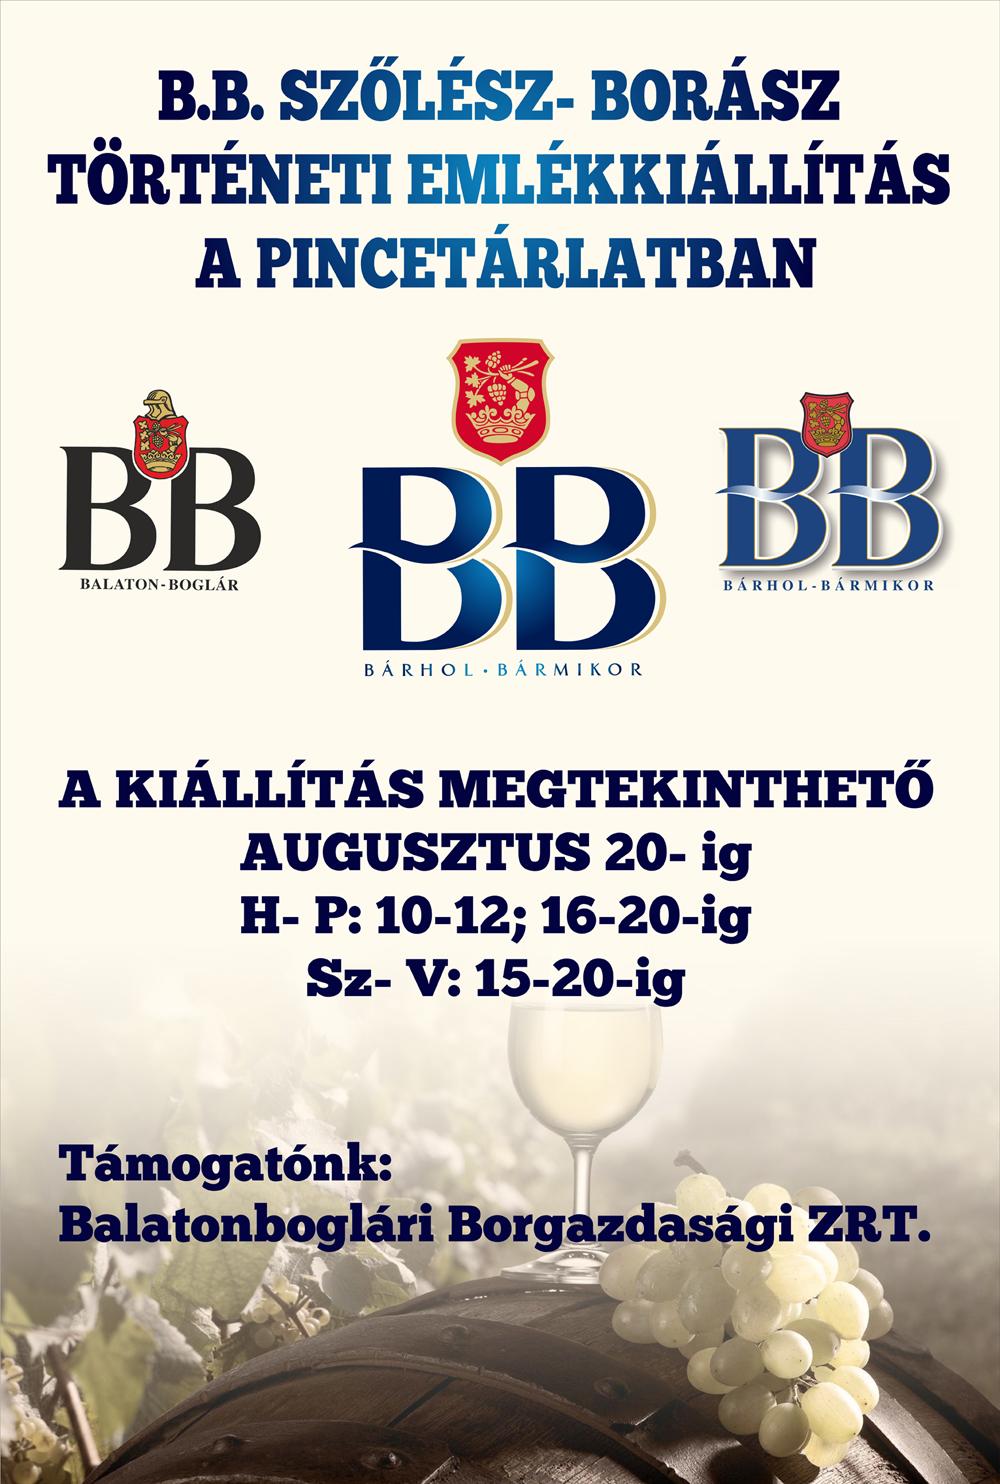 bb40-1